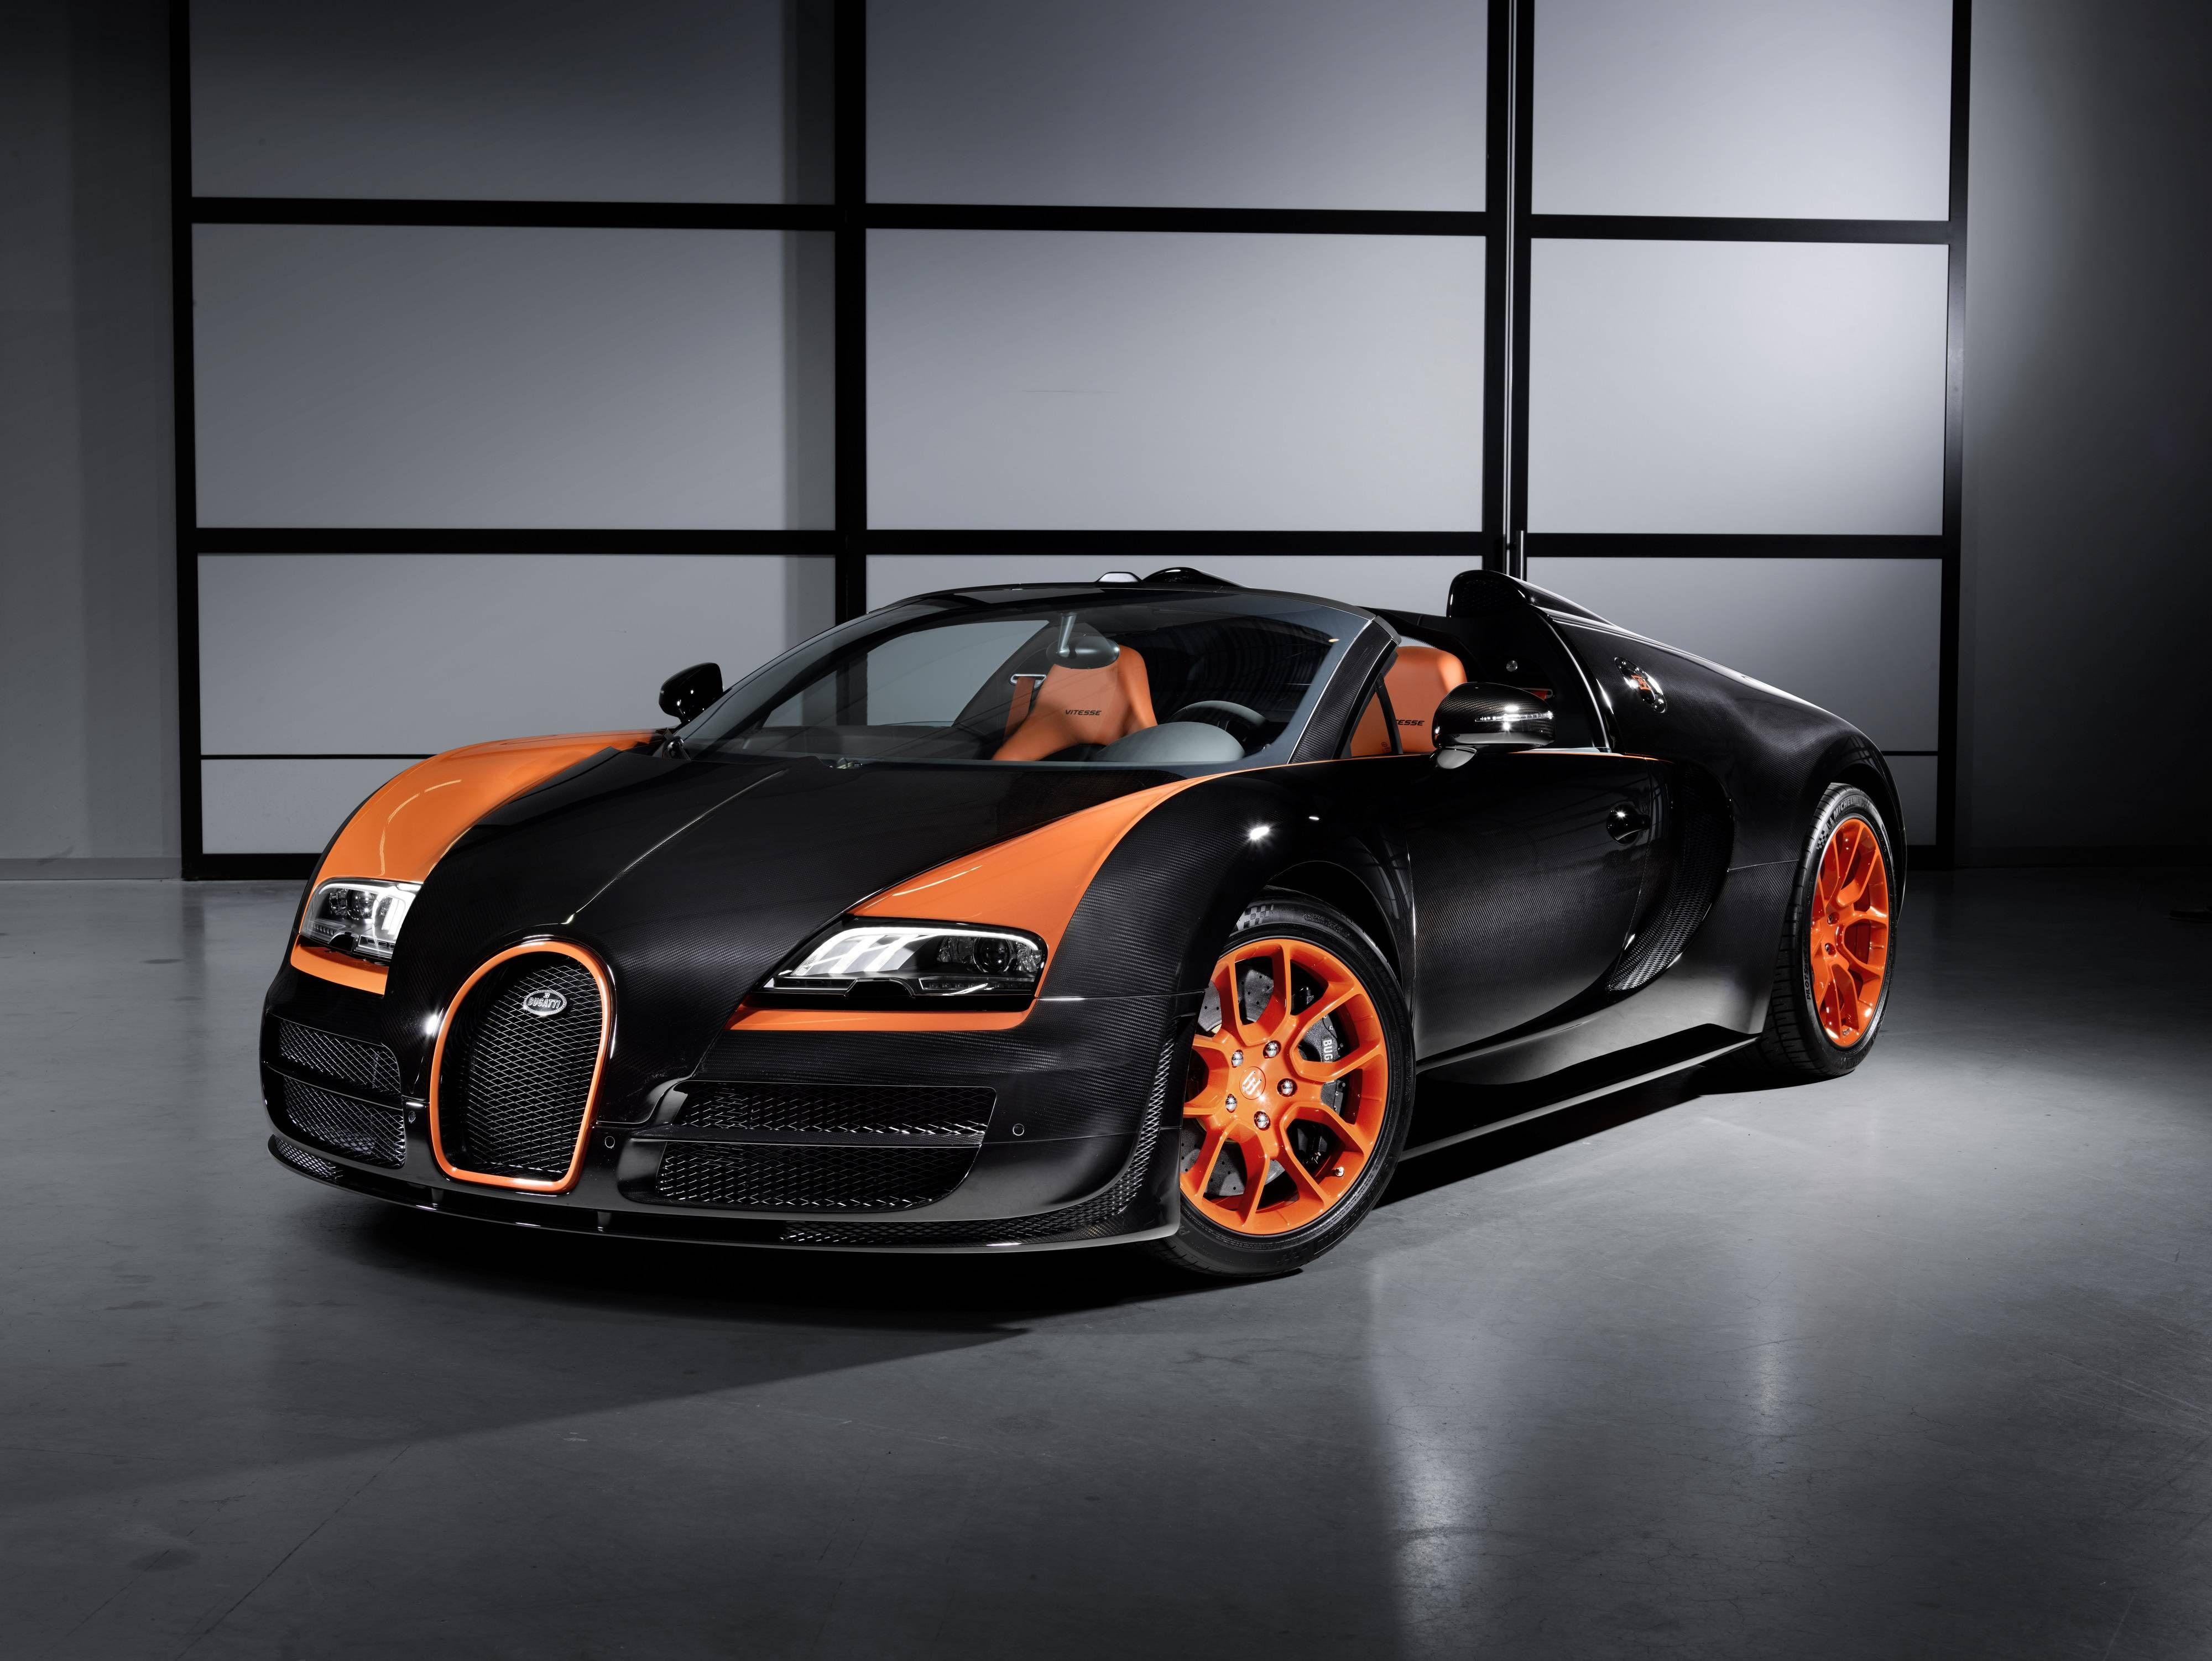 2013 Bugatti Veyron 16 4 Grand Sport Vitesse World Speed Record